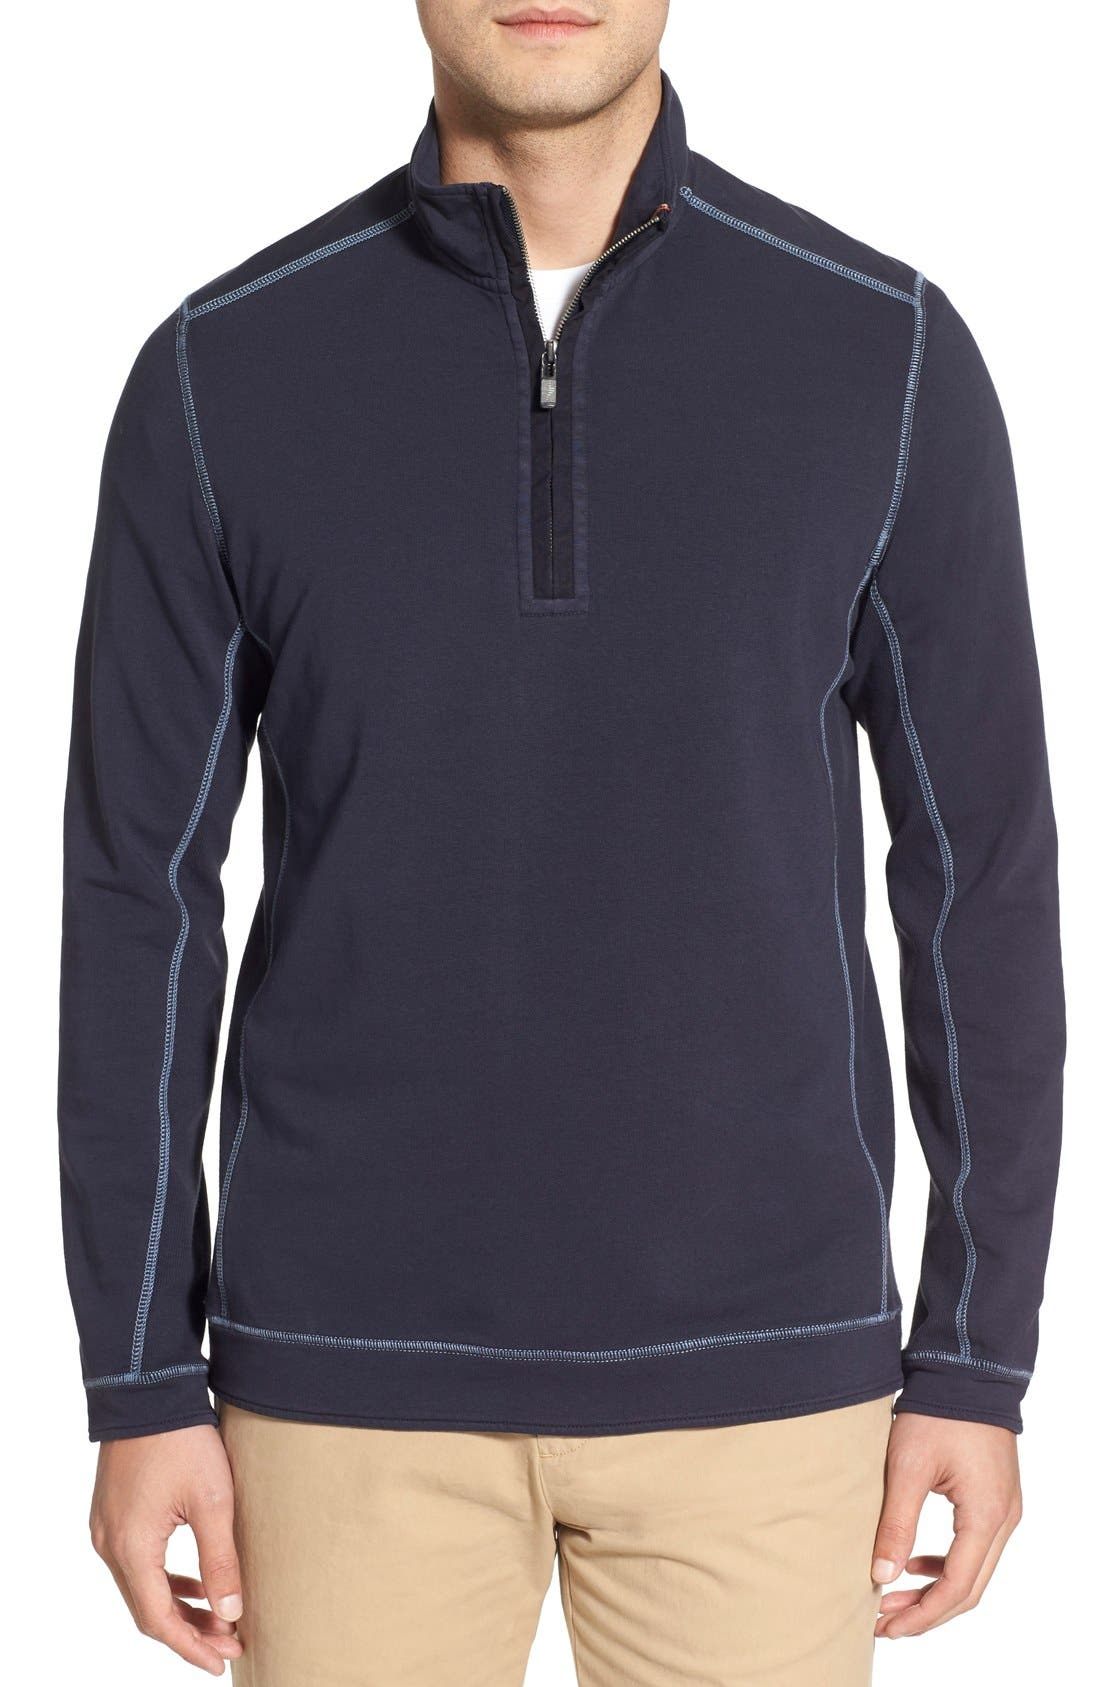 TOMMY BAHAMA 'Ben & Terry' Half Zip Pullover, Main, color, 001